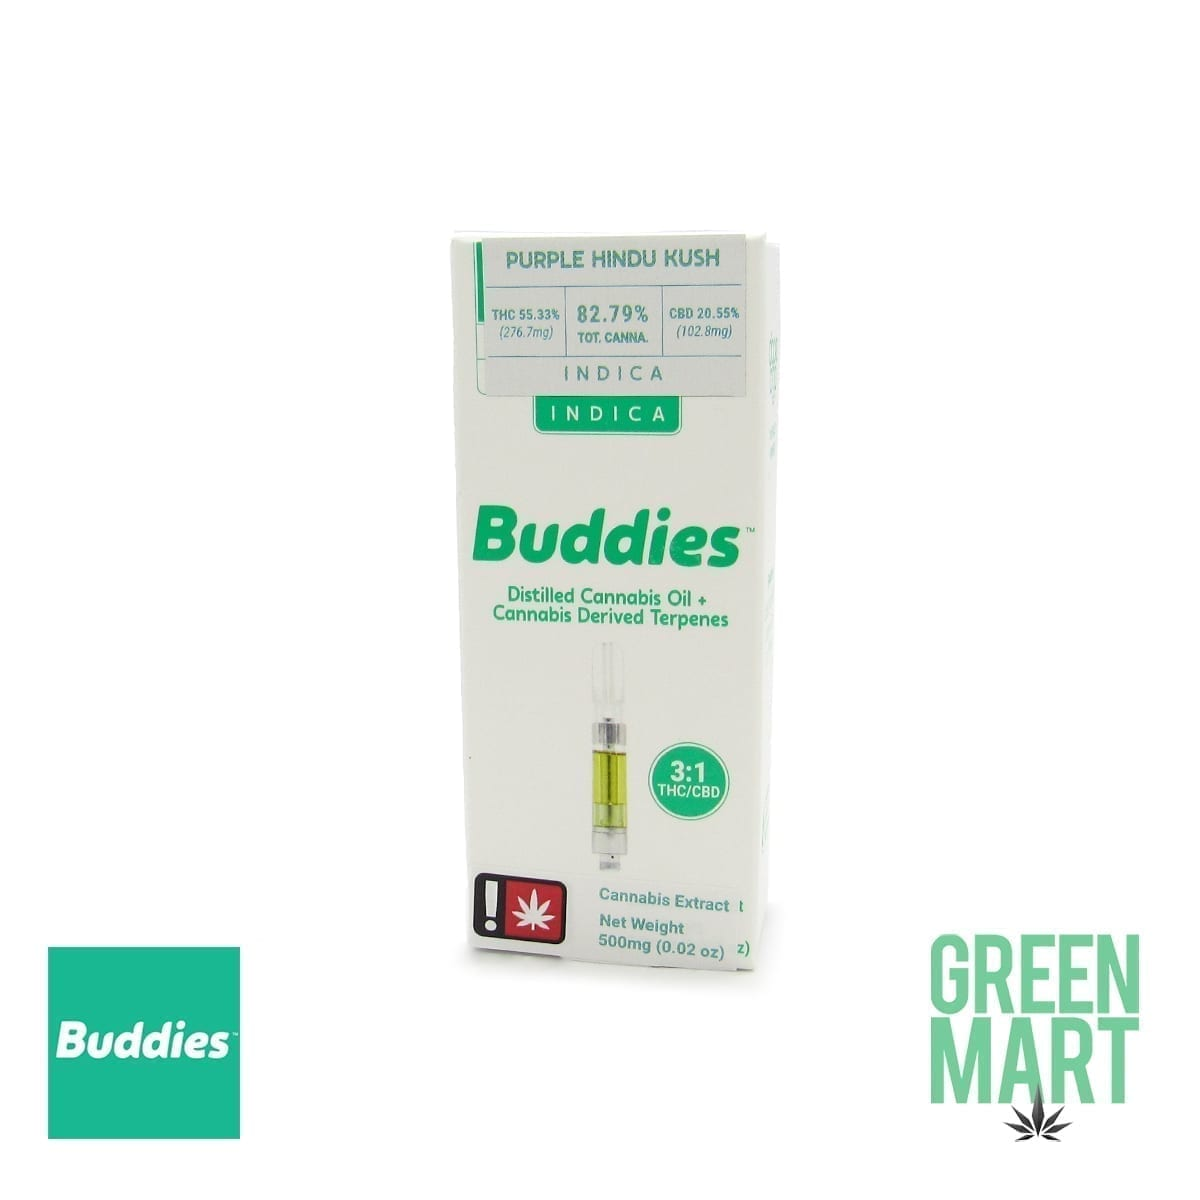 Buddies Brand Distillate Cartridge - CBD Purple Hindu Kush